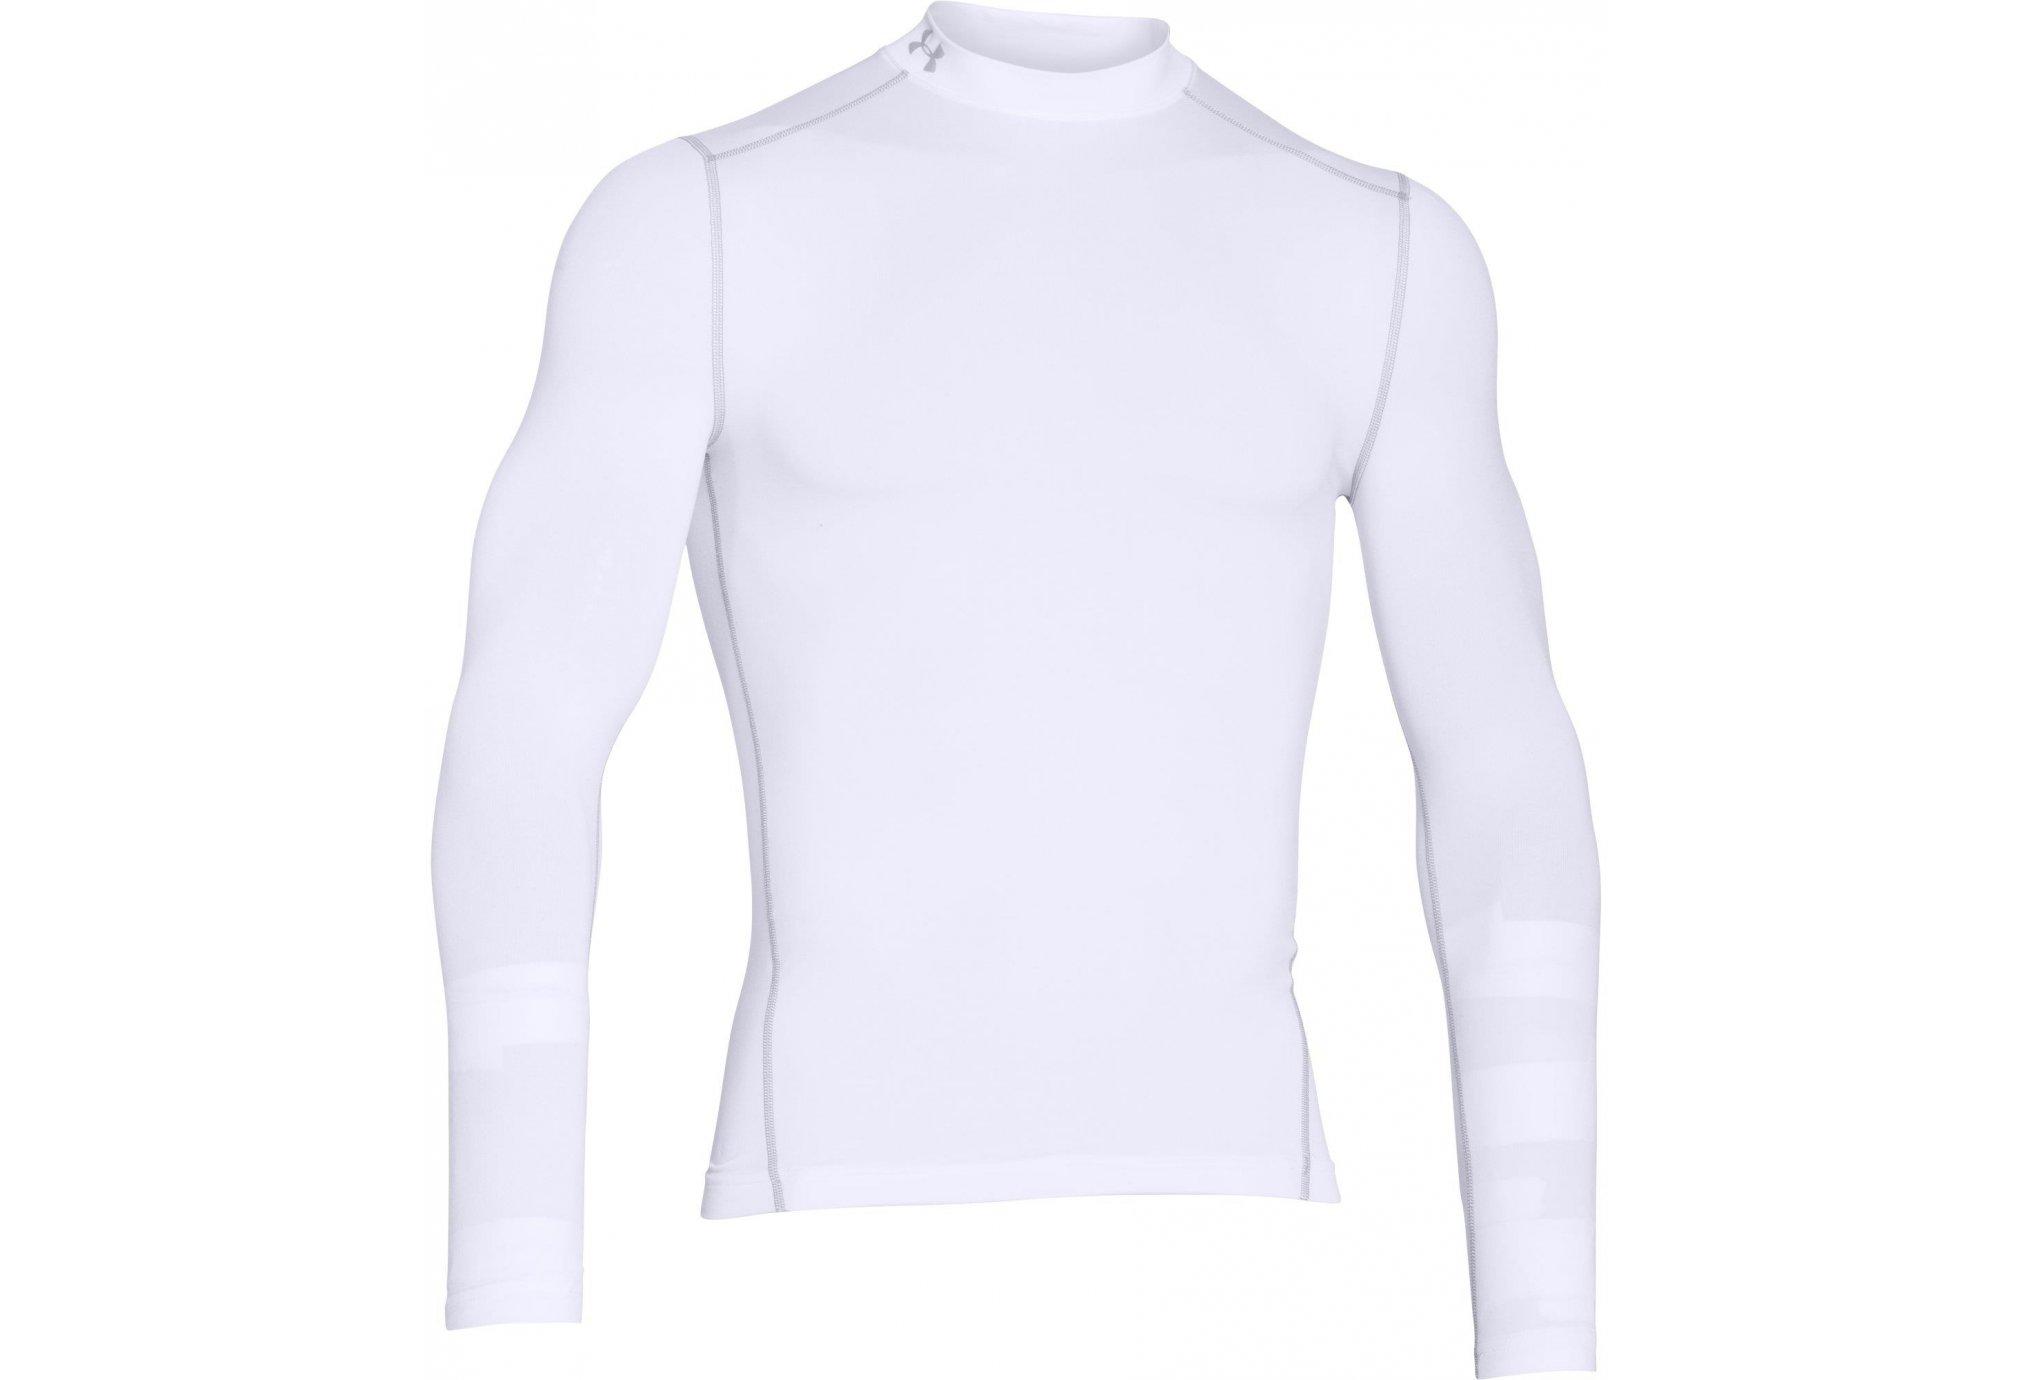 Under Armour Camiseta de compresión ColdGear vêtement running homme